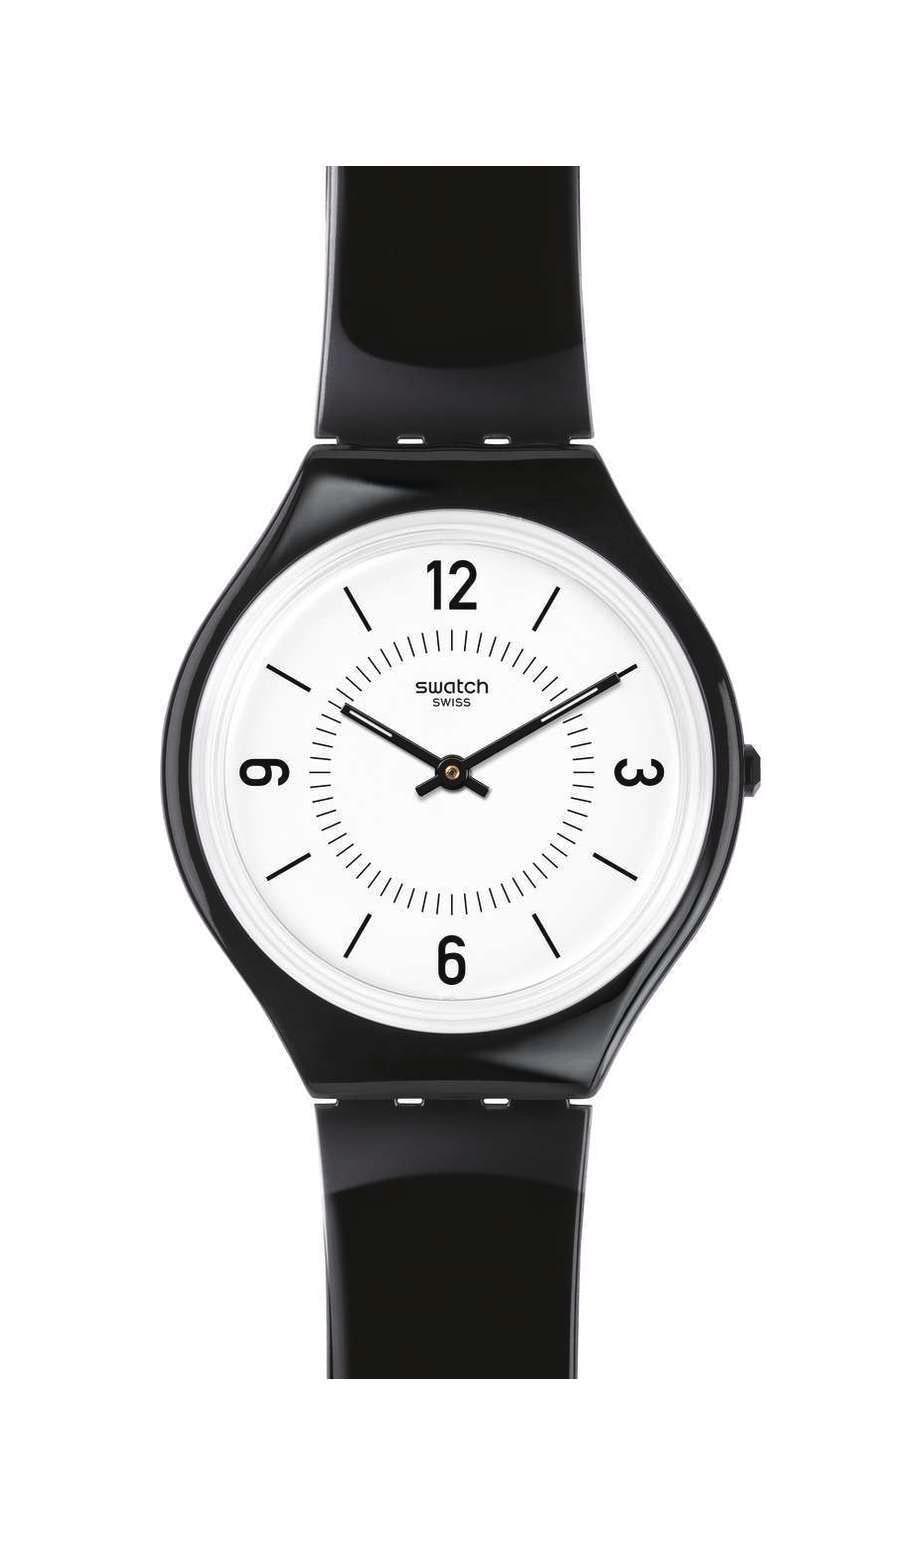 Swatch - SKINSUIT - 1